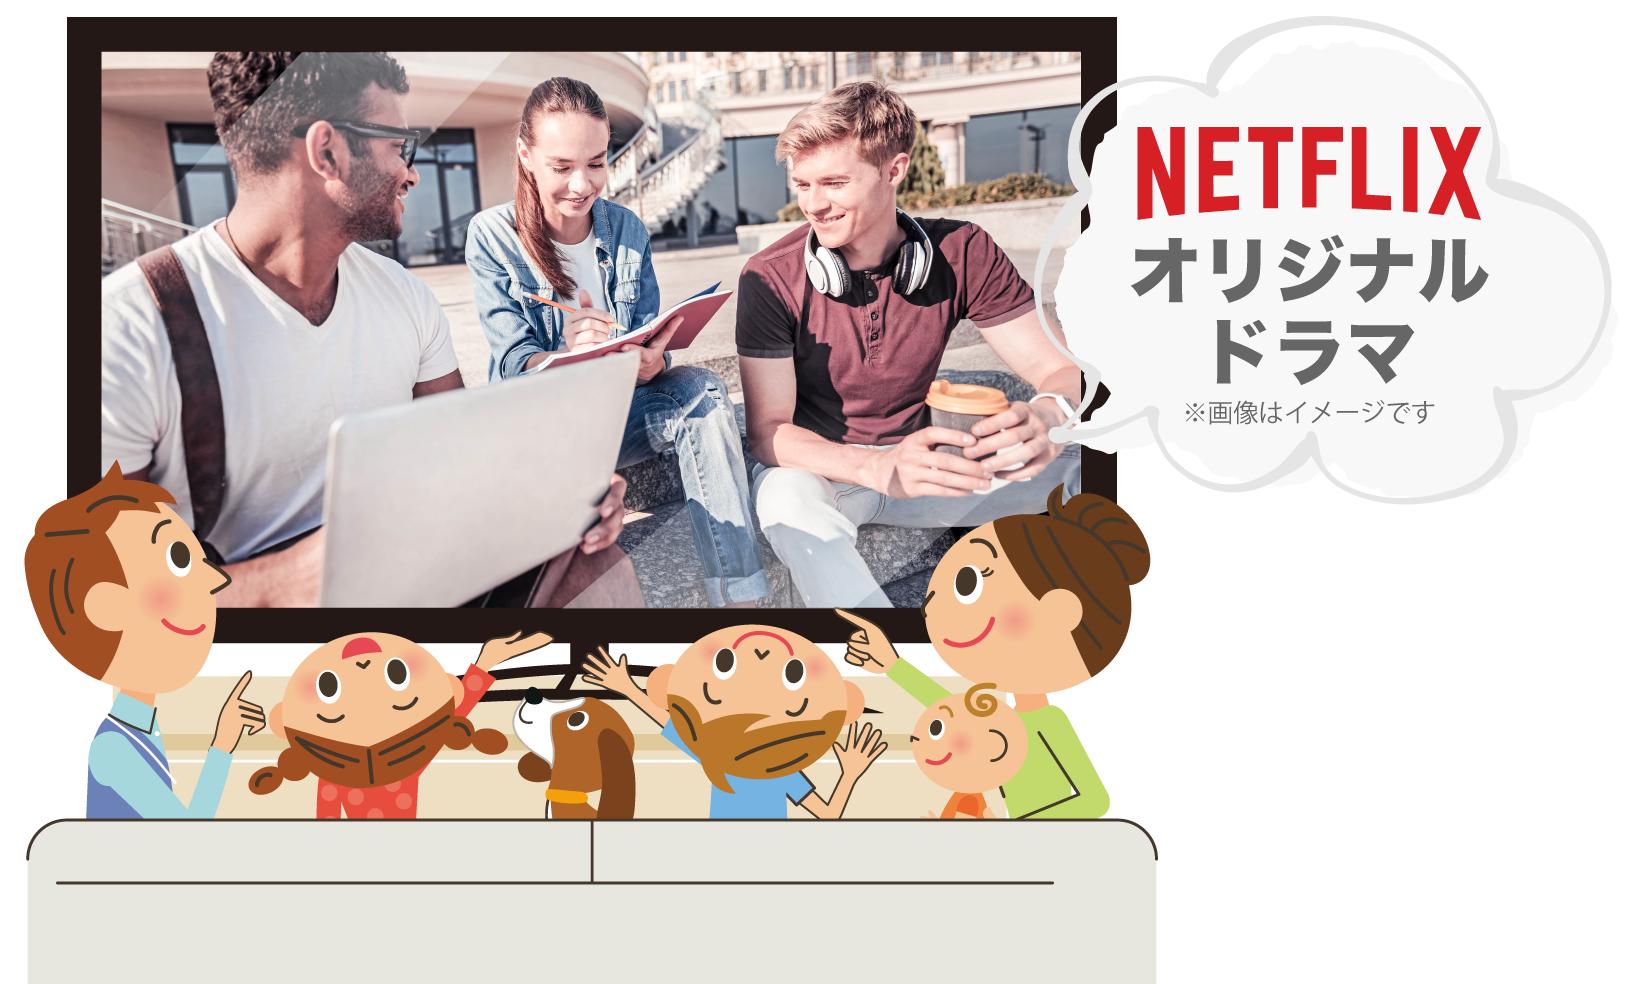 Netflix最大の魅力はオリジナルドラマ